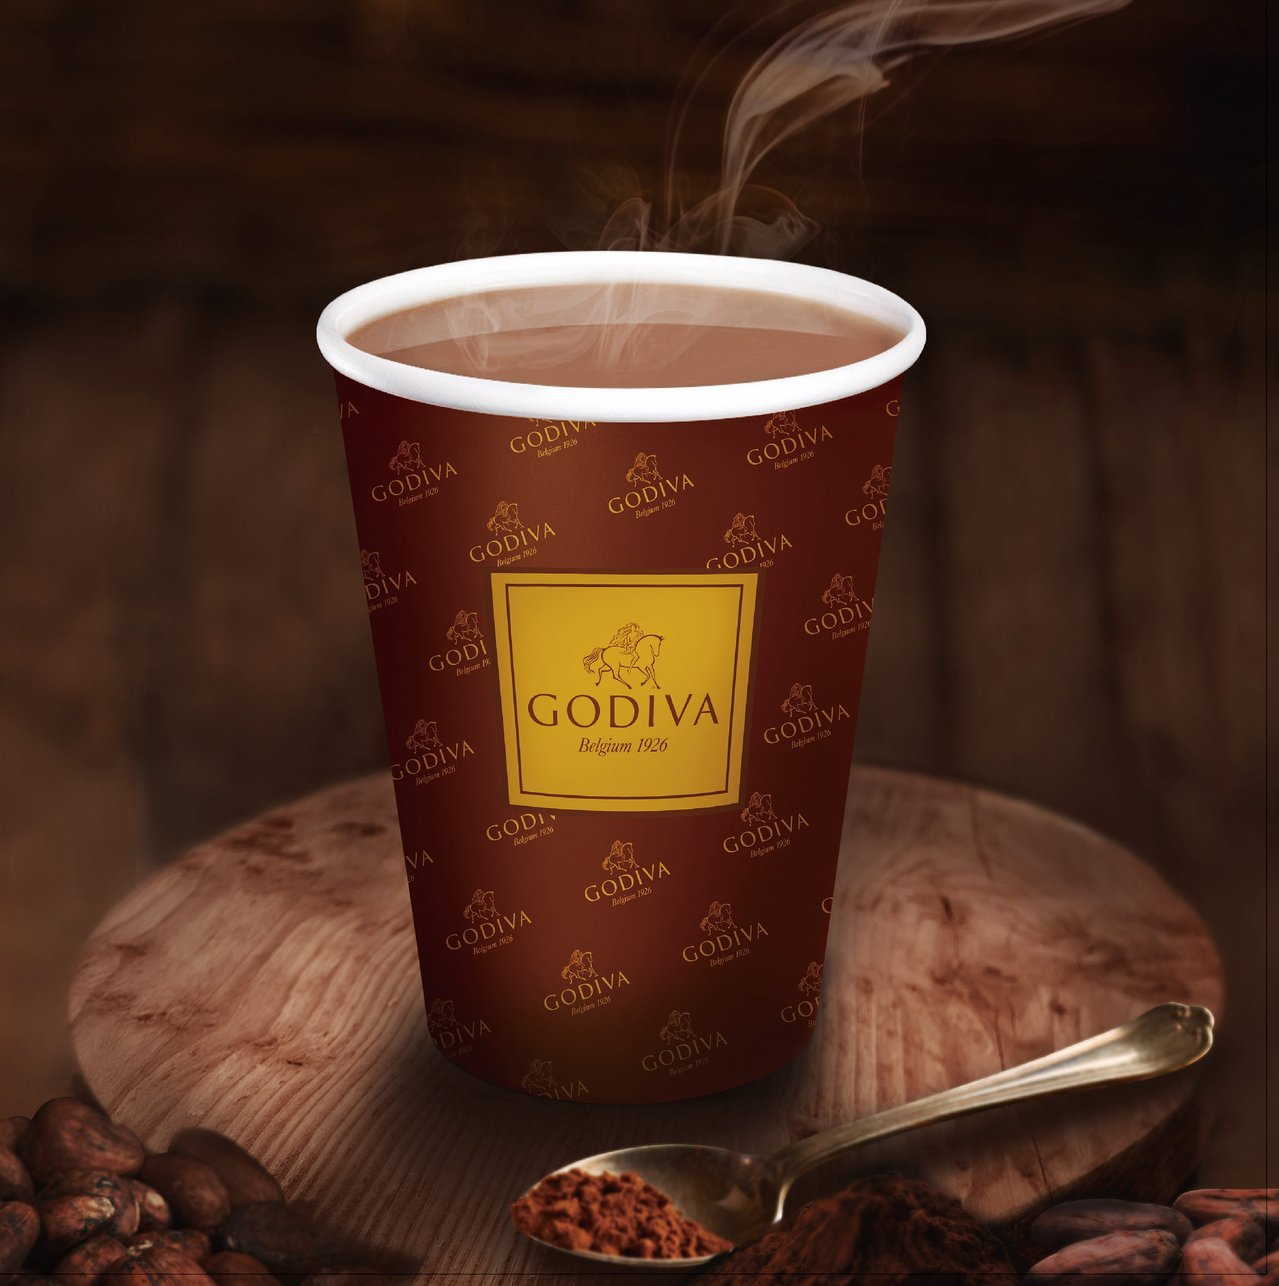 GODIVA經典熱巧克力每杯99元、限量50萬杯。圖/7-ELEVEN提供